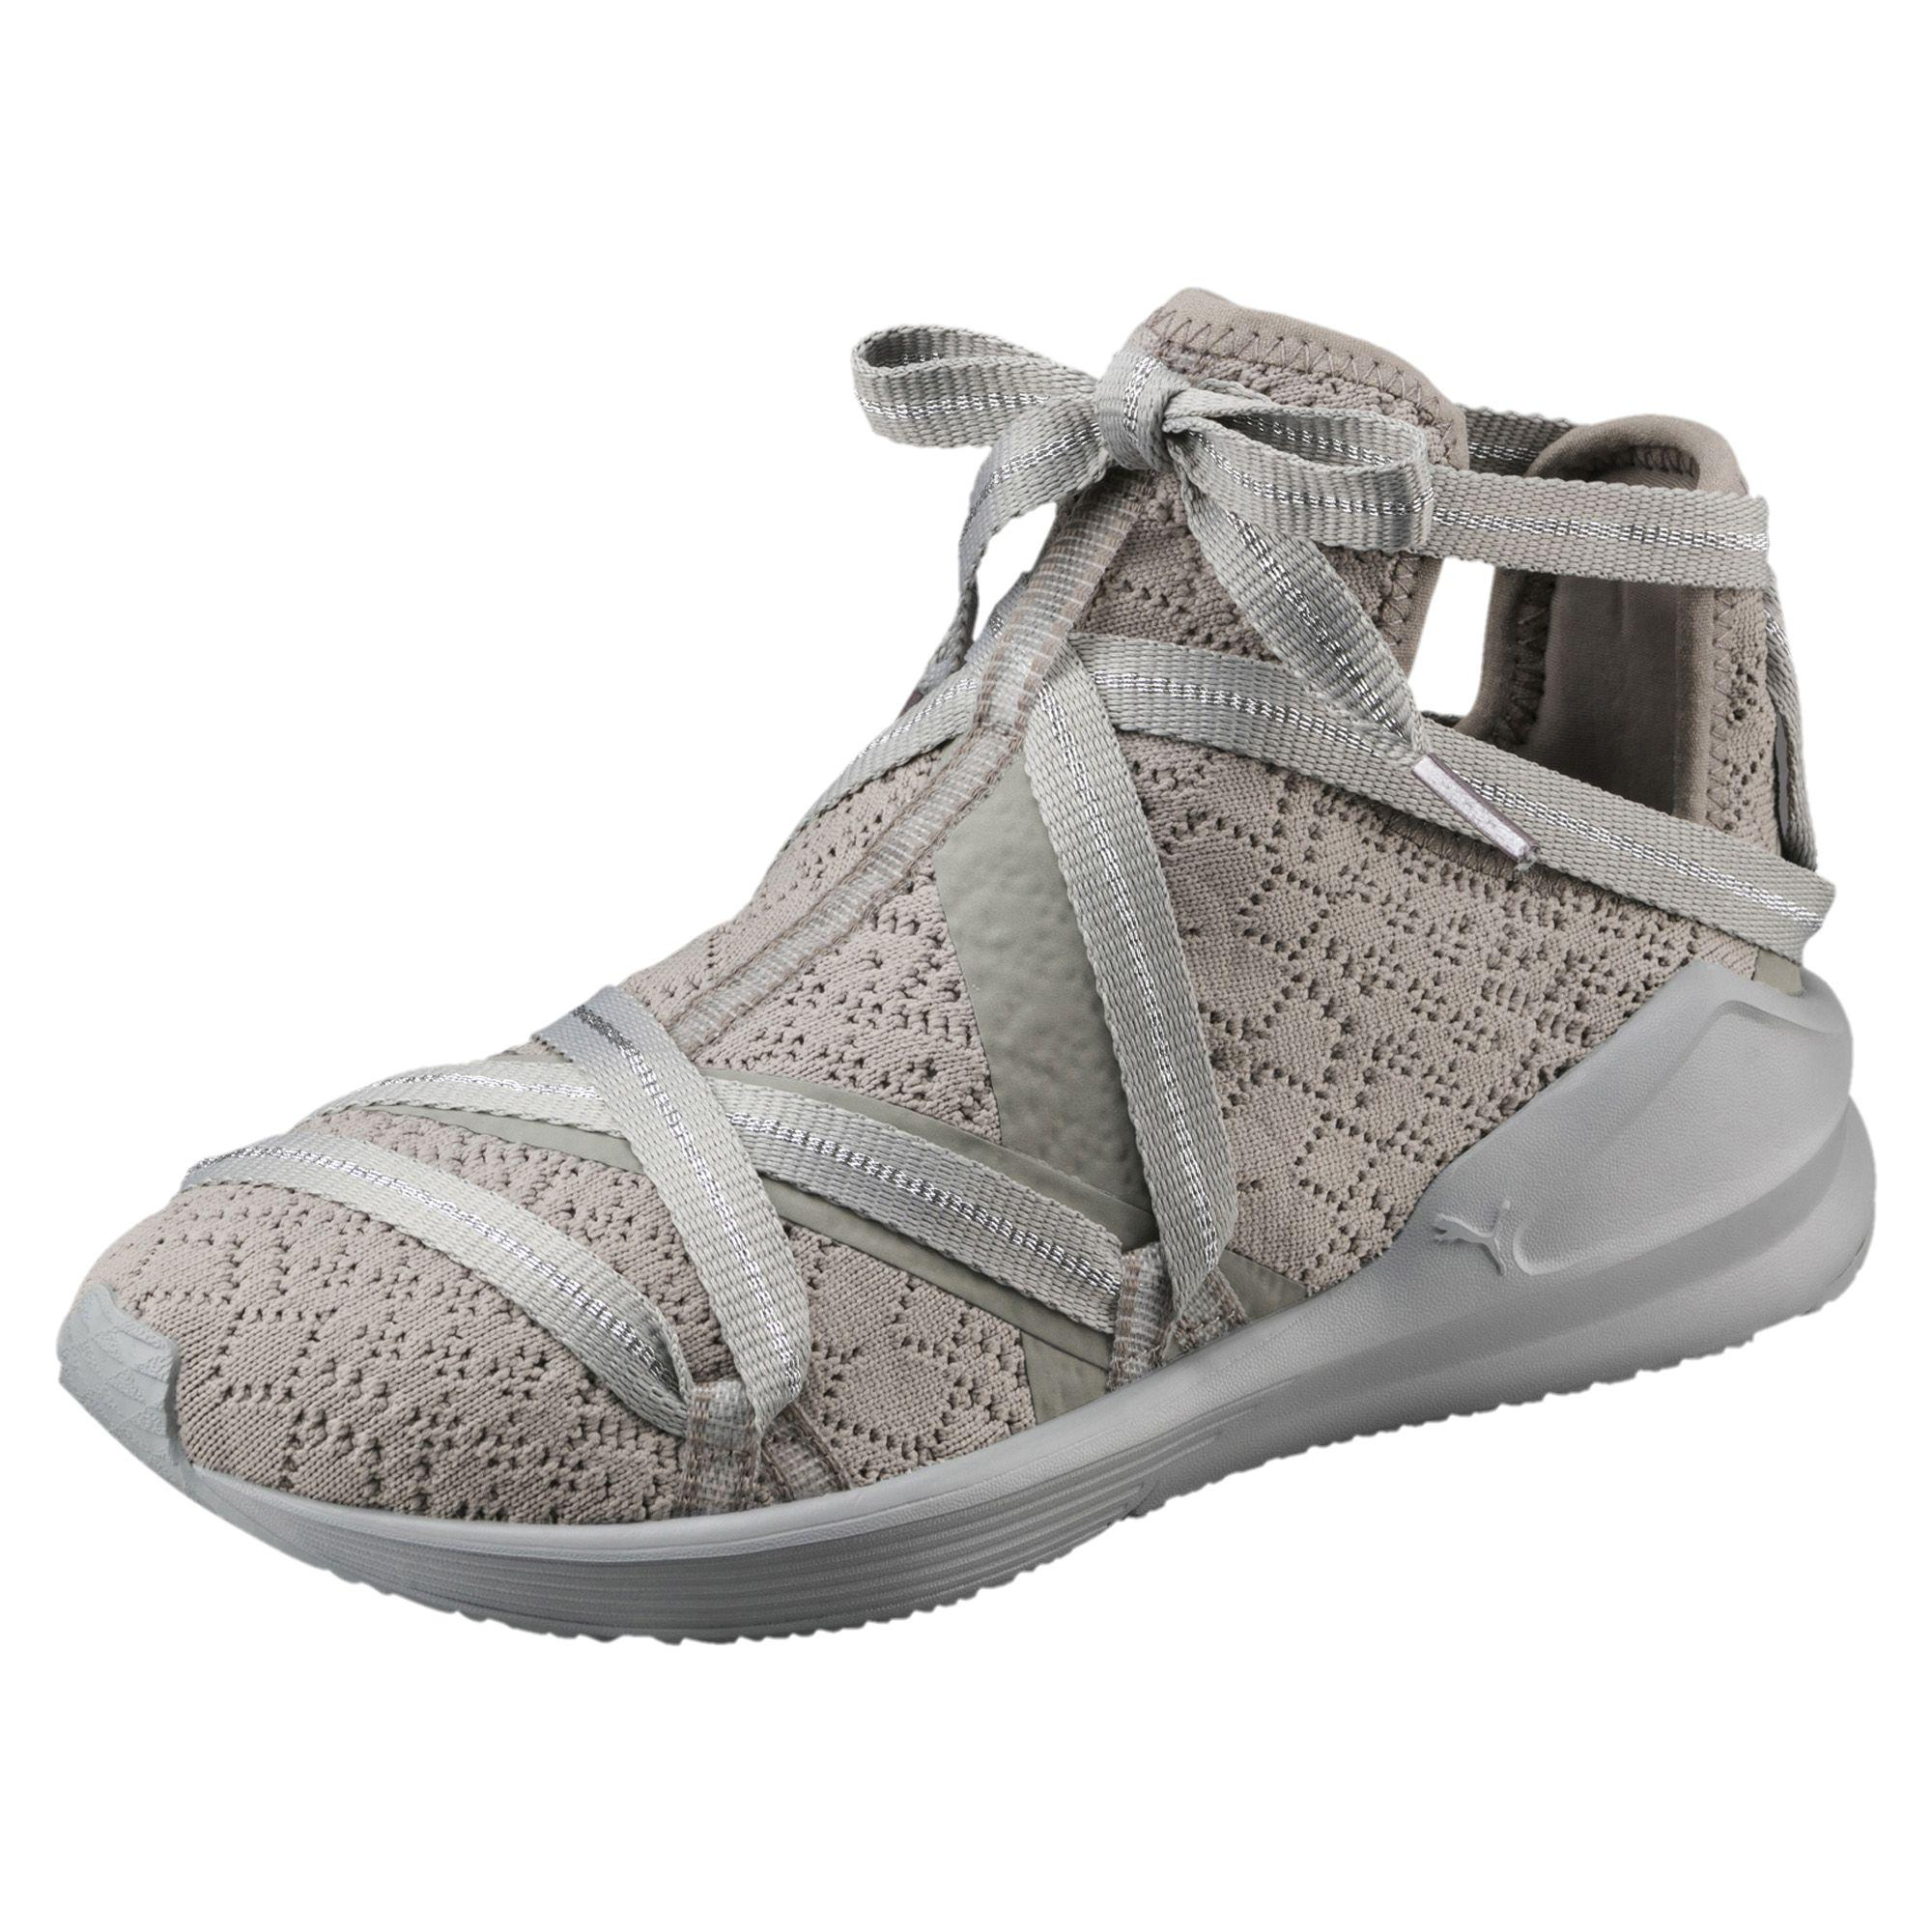 1a973616ca5e86 Lyst - PUMA Fierce Rope Ep Women s Training Shoes